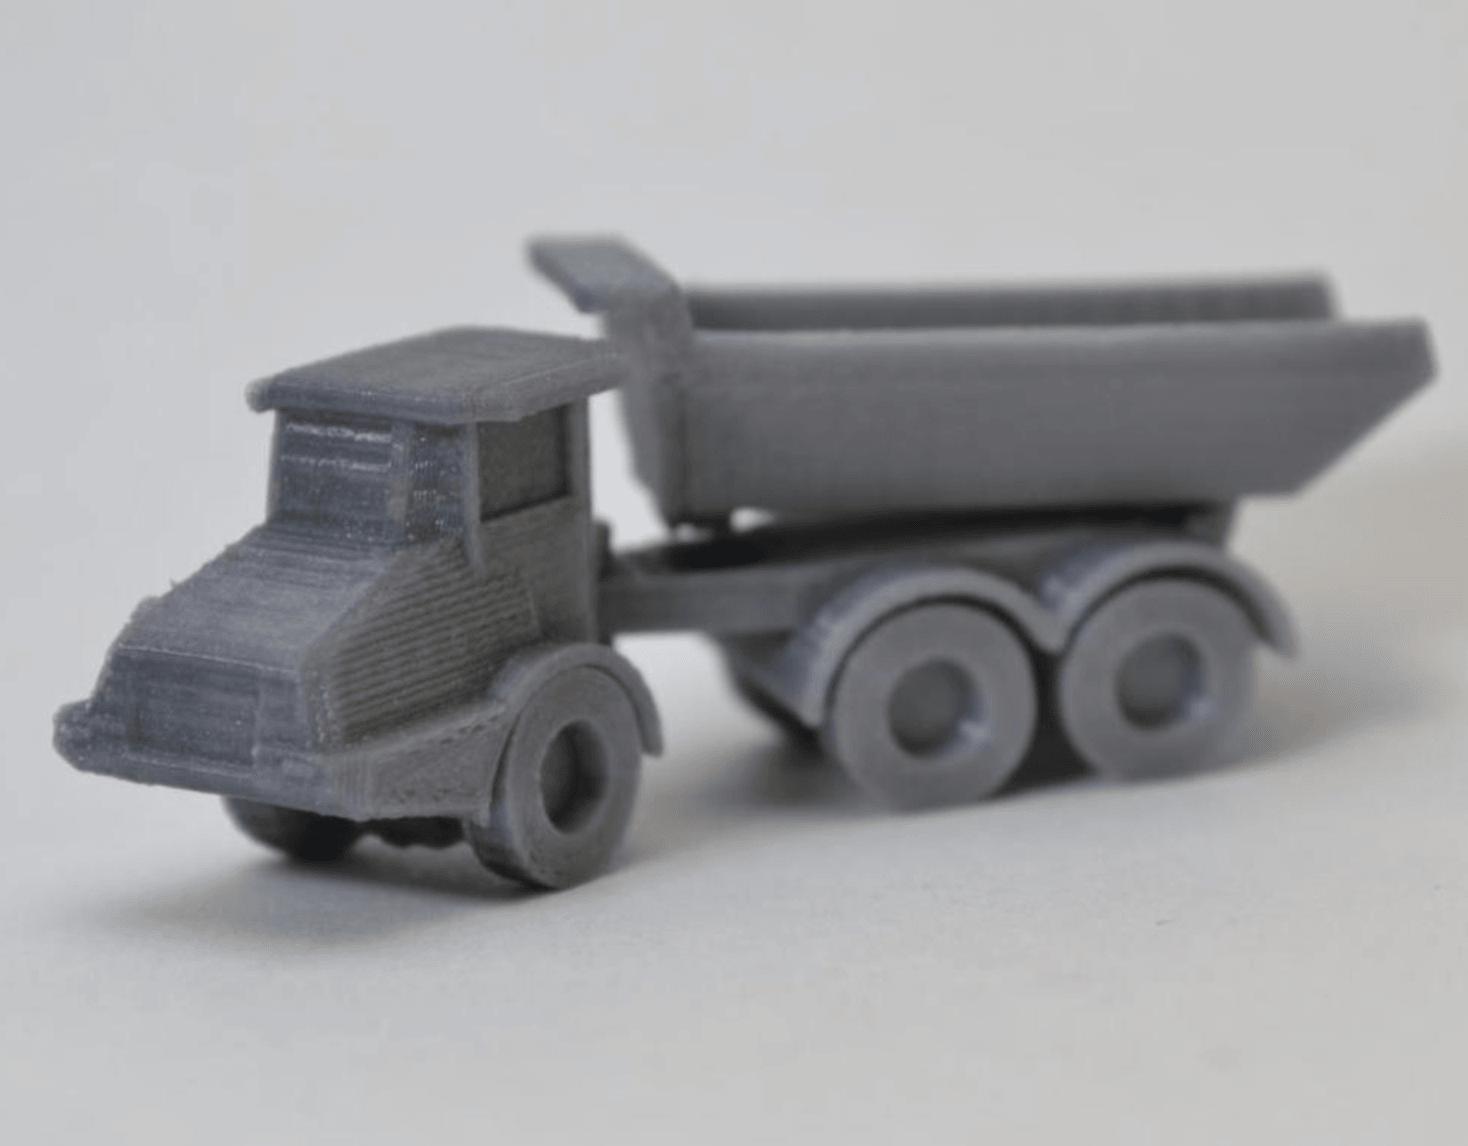 Capture d'écran 2018-03-13 à 17.57.03.png Download free STL file Articulated Dump Truck • Design to 3D print, MakeItWork